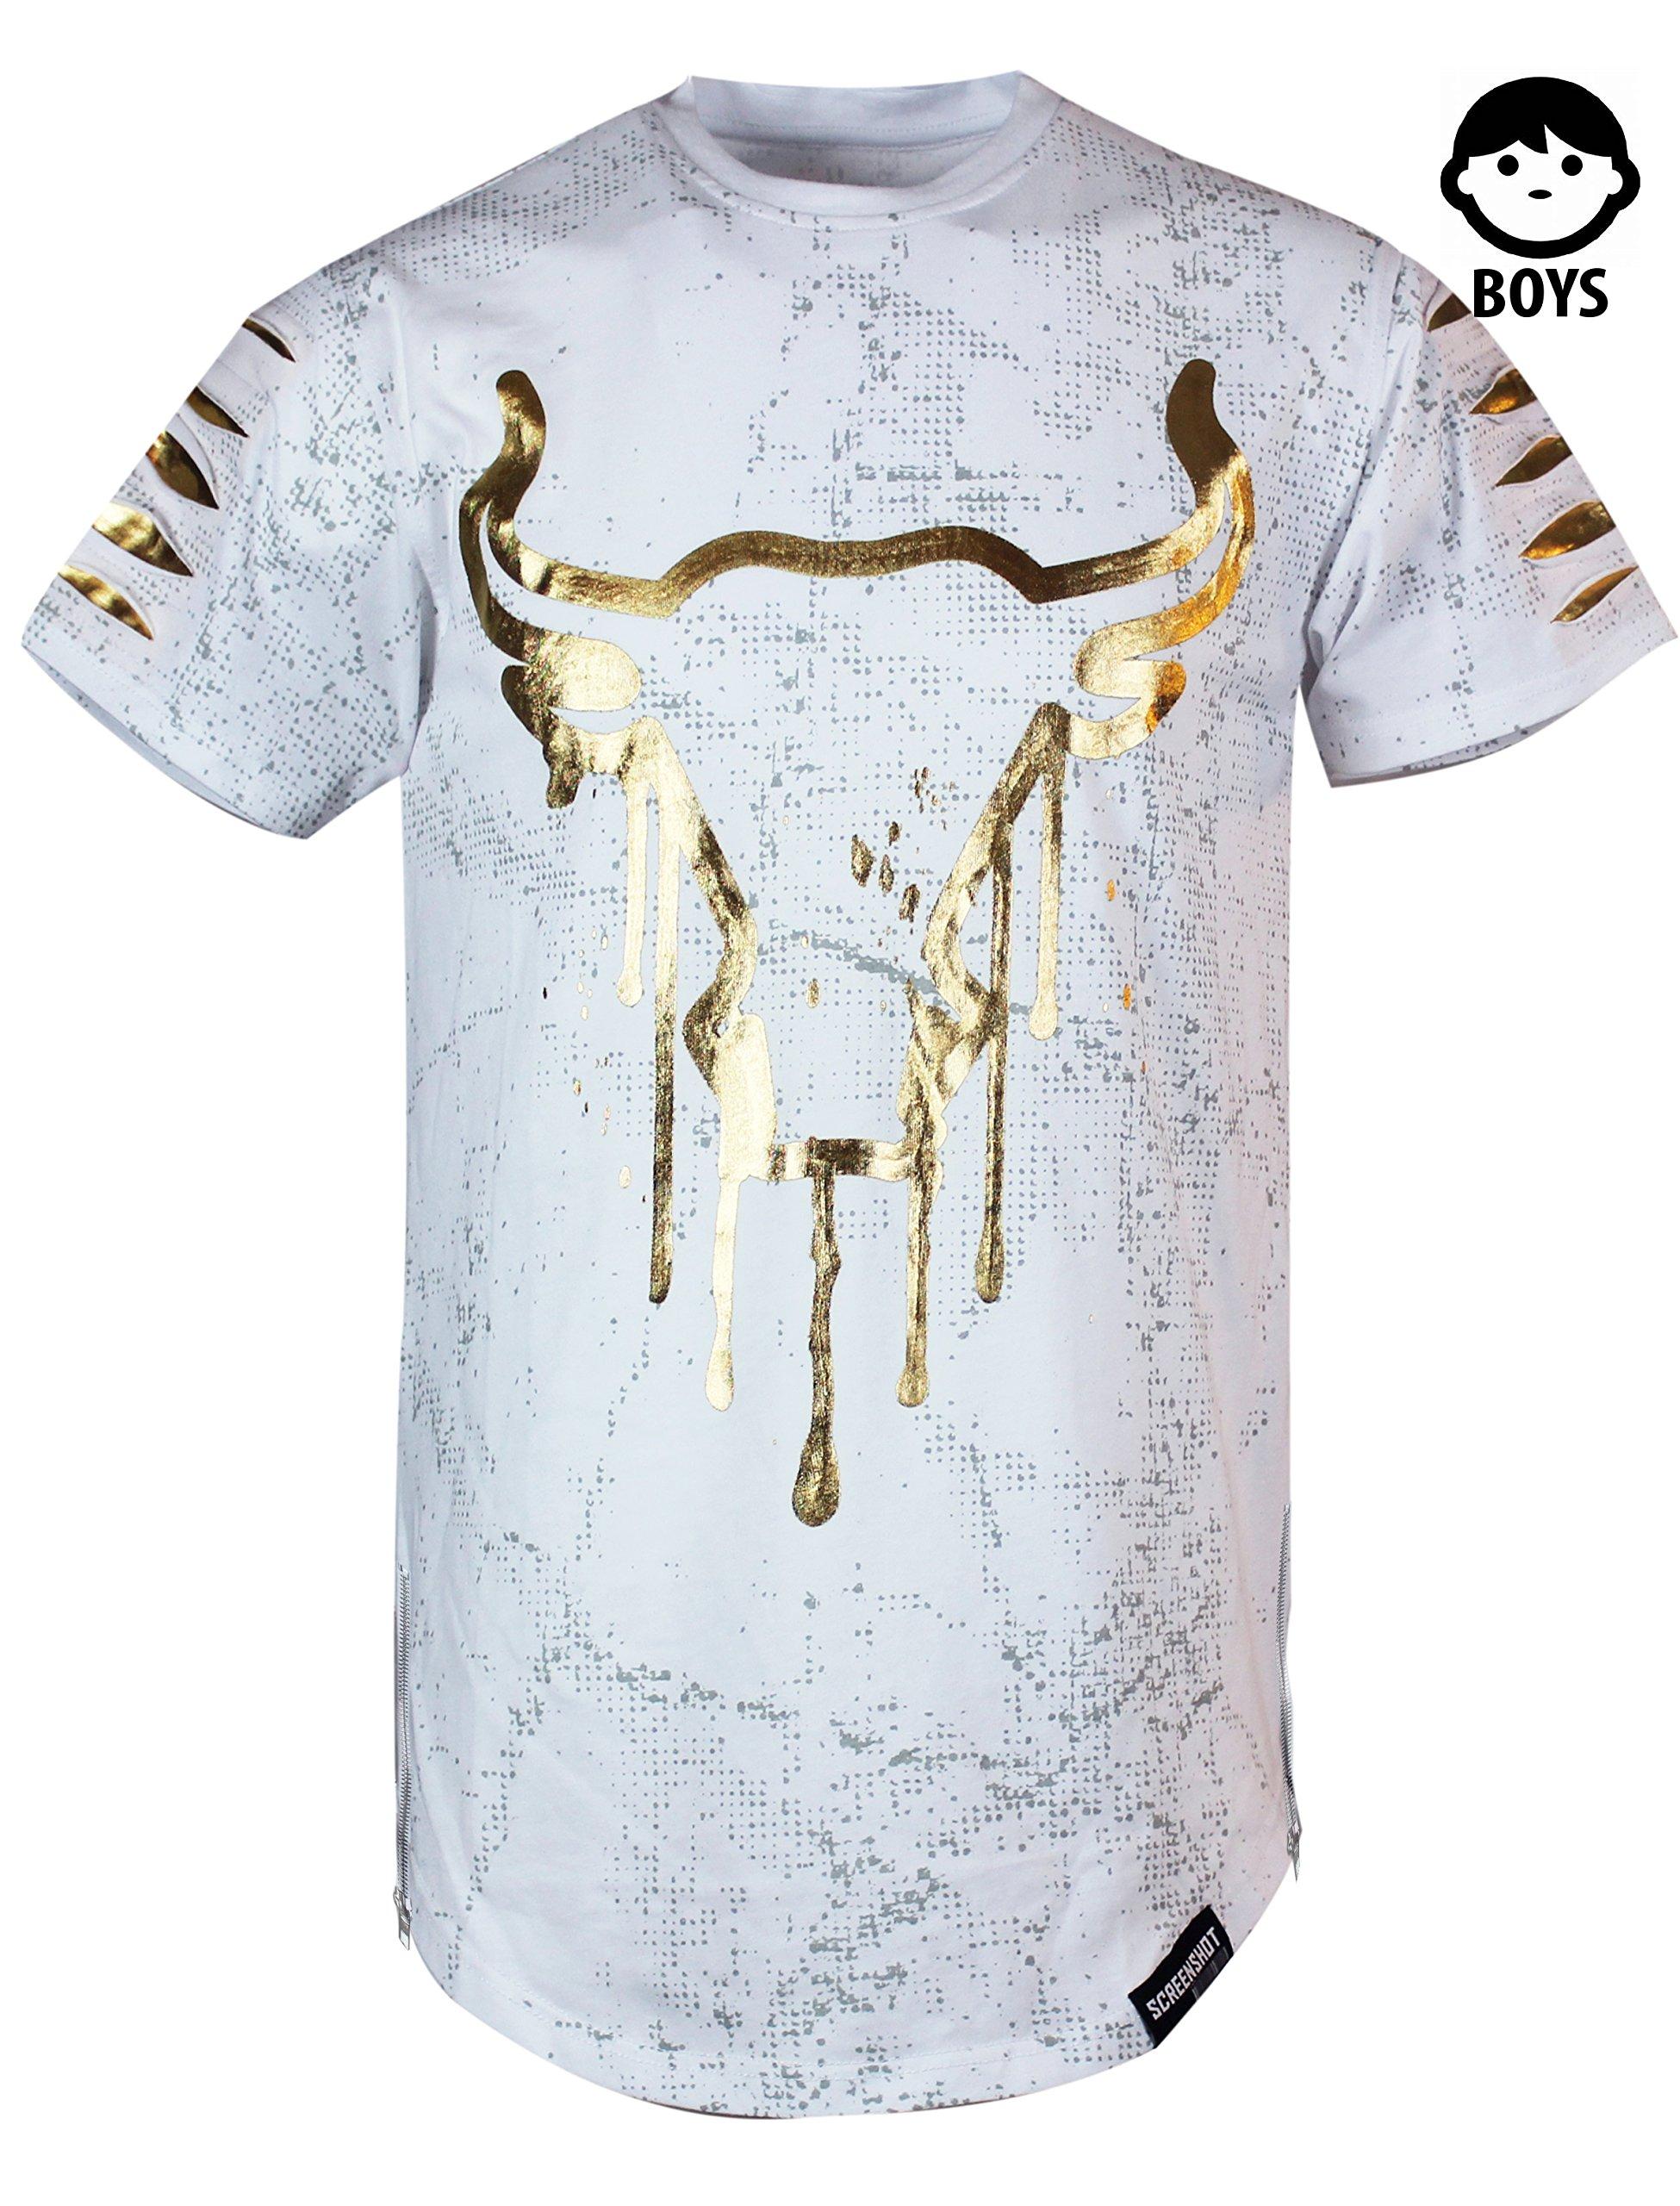 SCREENSHOTBRAND-S11702BY Boys Hipster Hip-Hop Premiun Tees - Stylish Latest Fashion T-Shirts - Drip Bull Print-White-Medim